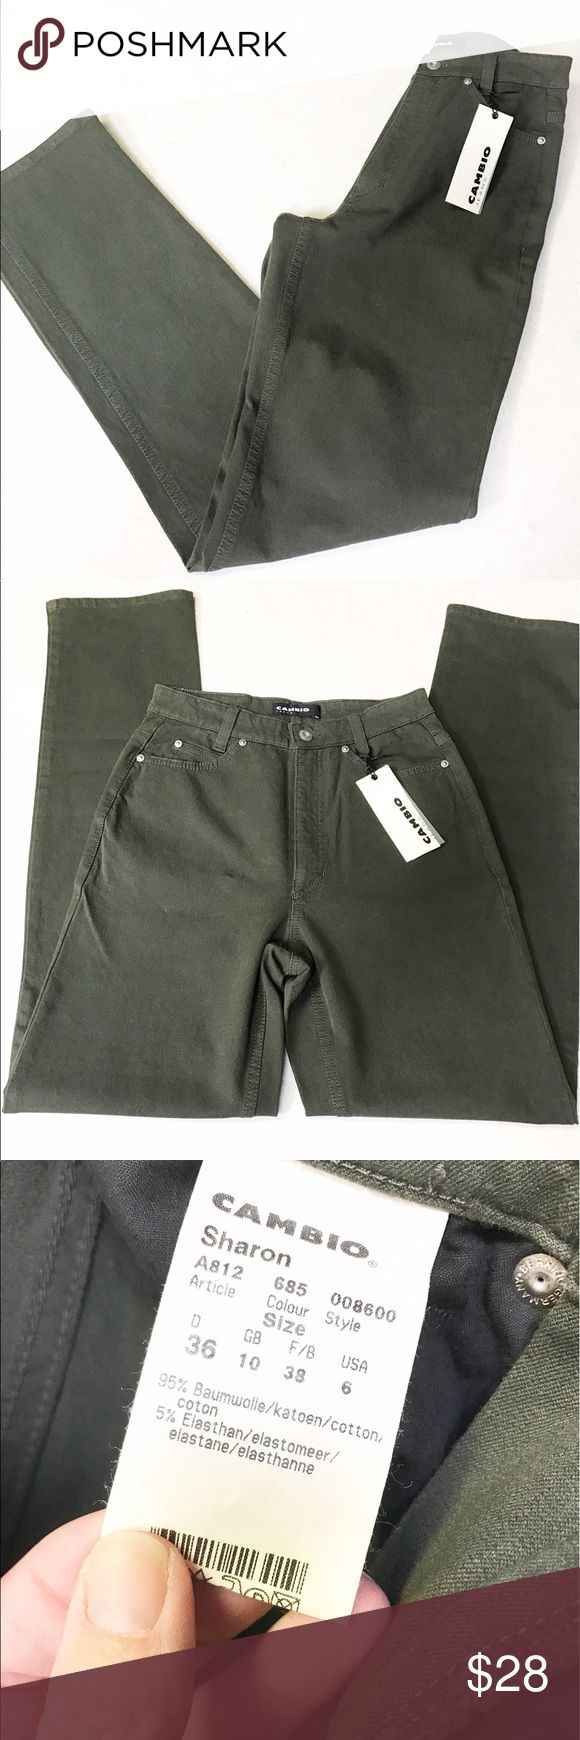 NWT. Cambio Jeans, size 6. Sharon cut, high waist NWT. Cambio Jeans size 6. Khaki green, in the high waisted (mom Jean) Sharon cut. Cambio Jeans Jeans